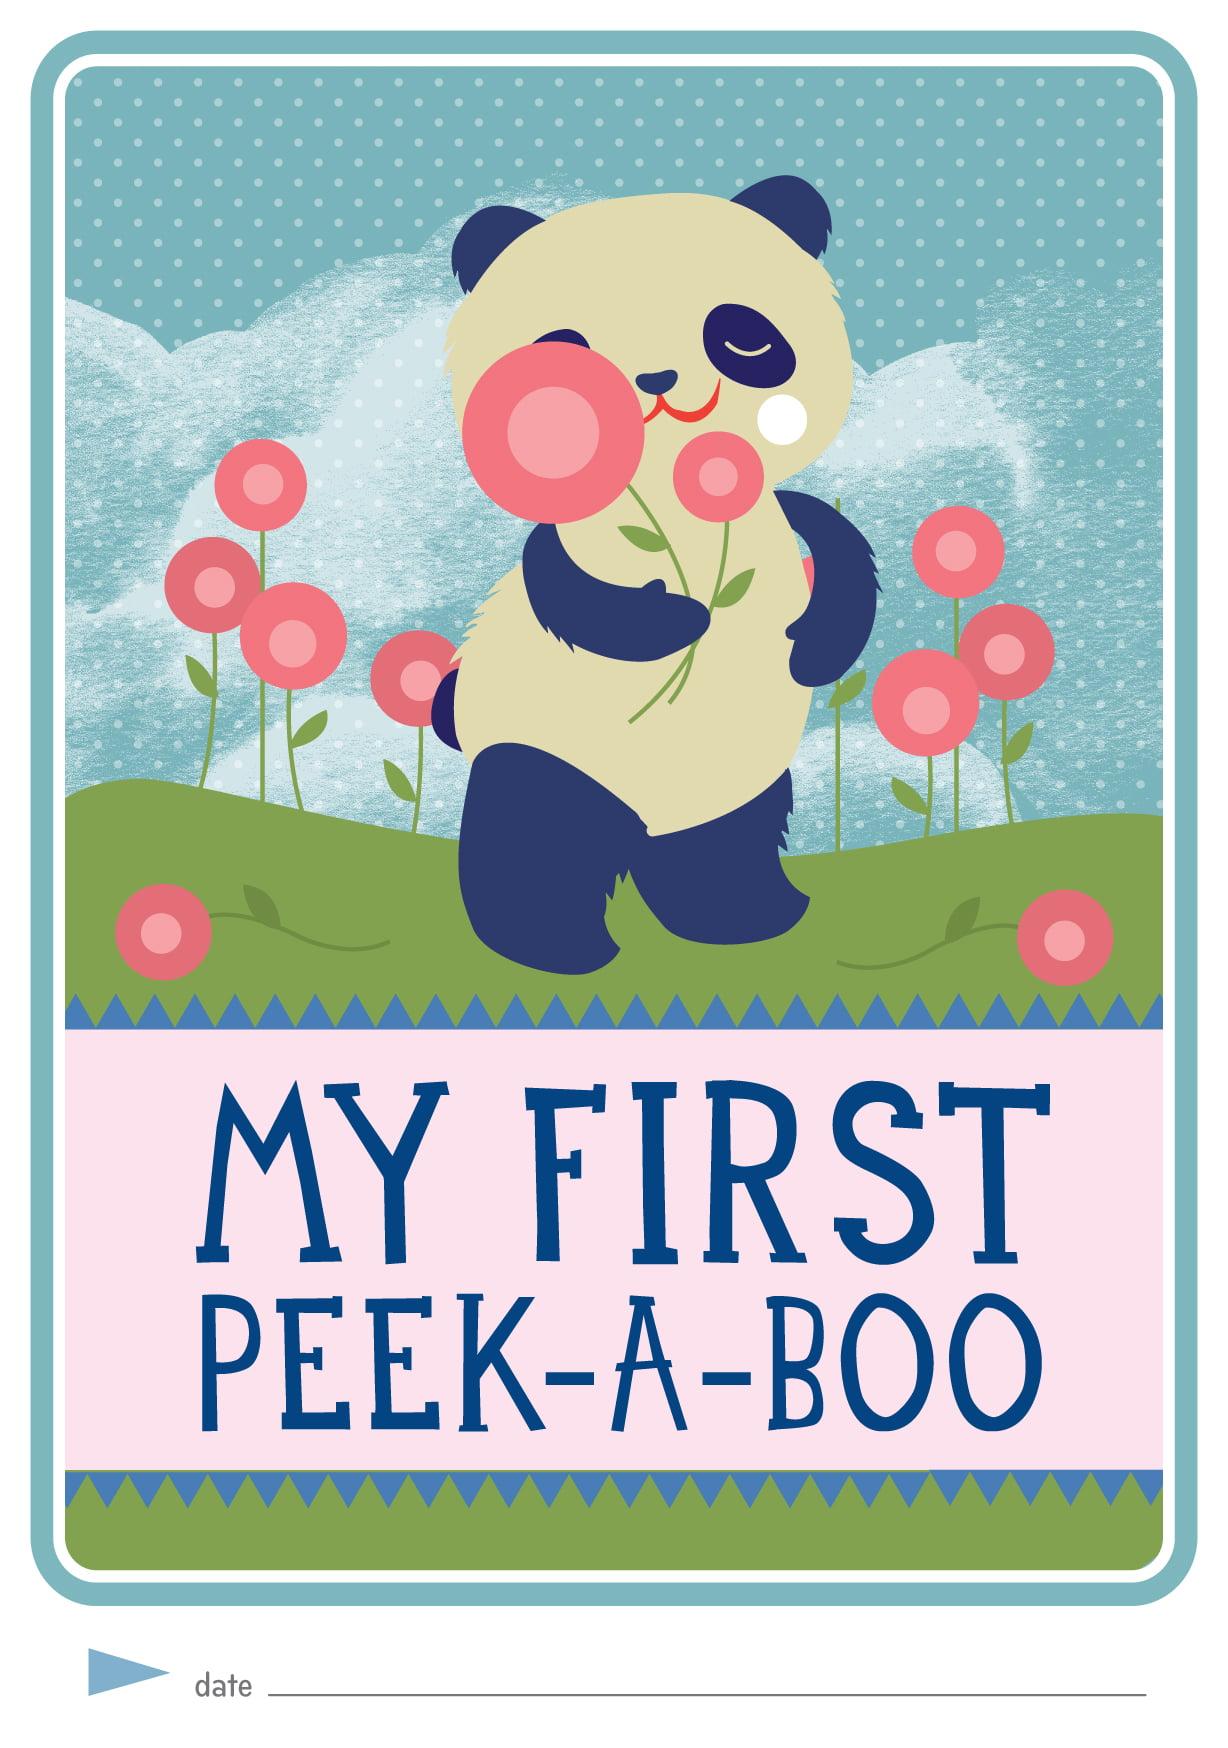 Safety 1st Premium Baby Care /& Precious Memories Set Fox $75 Value